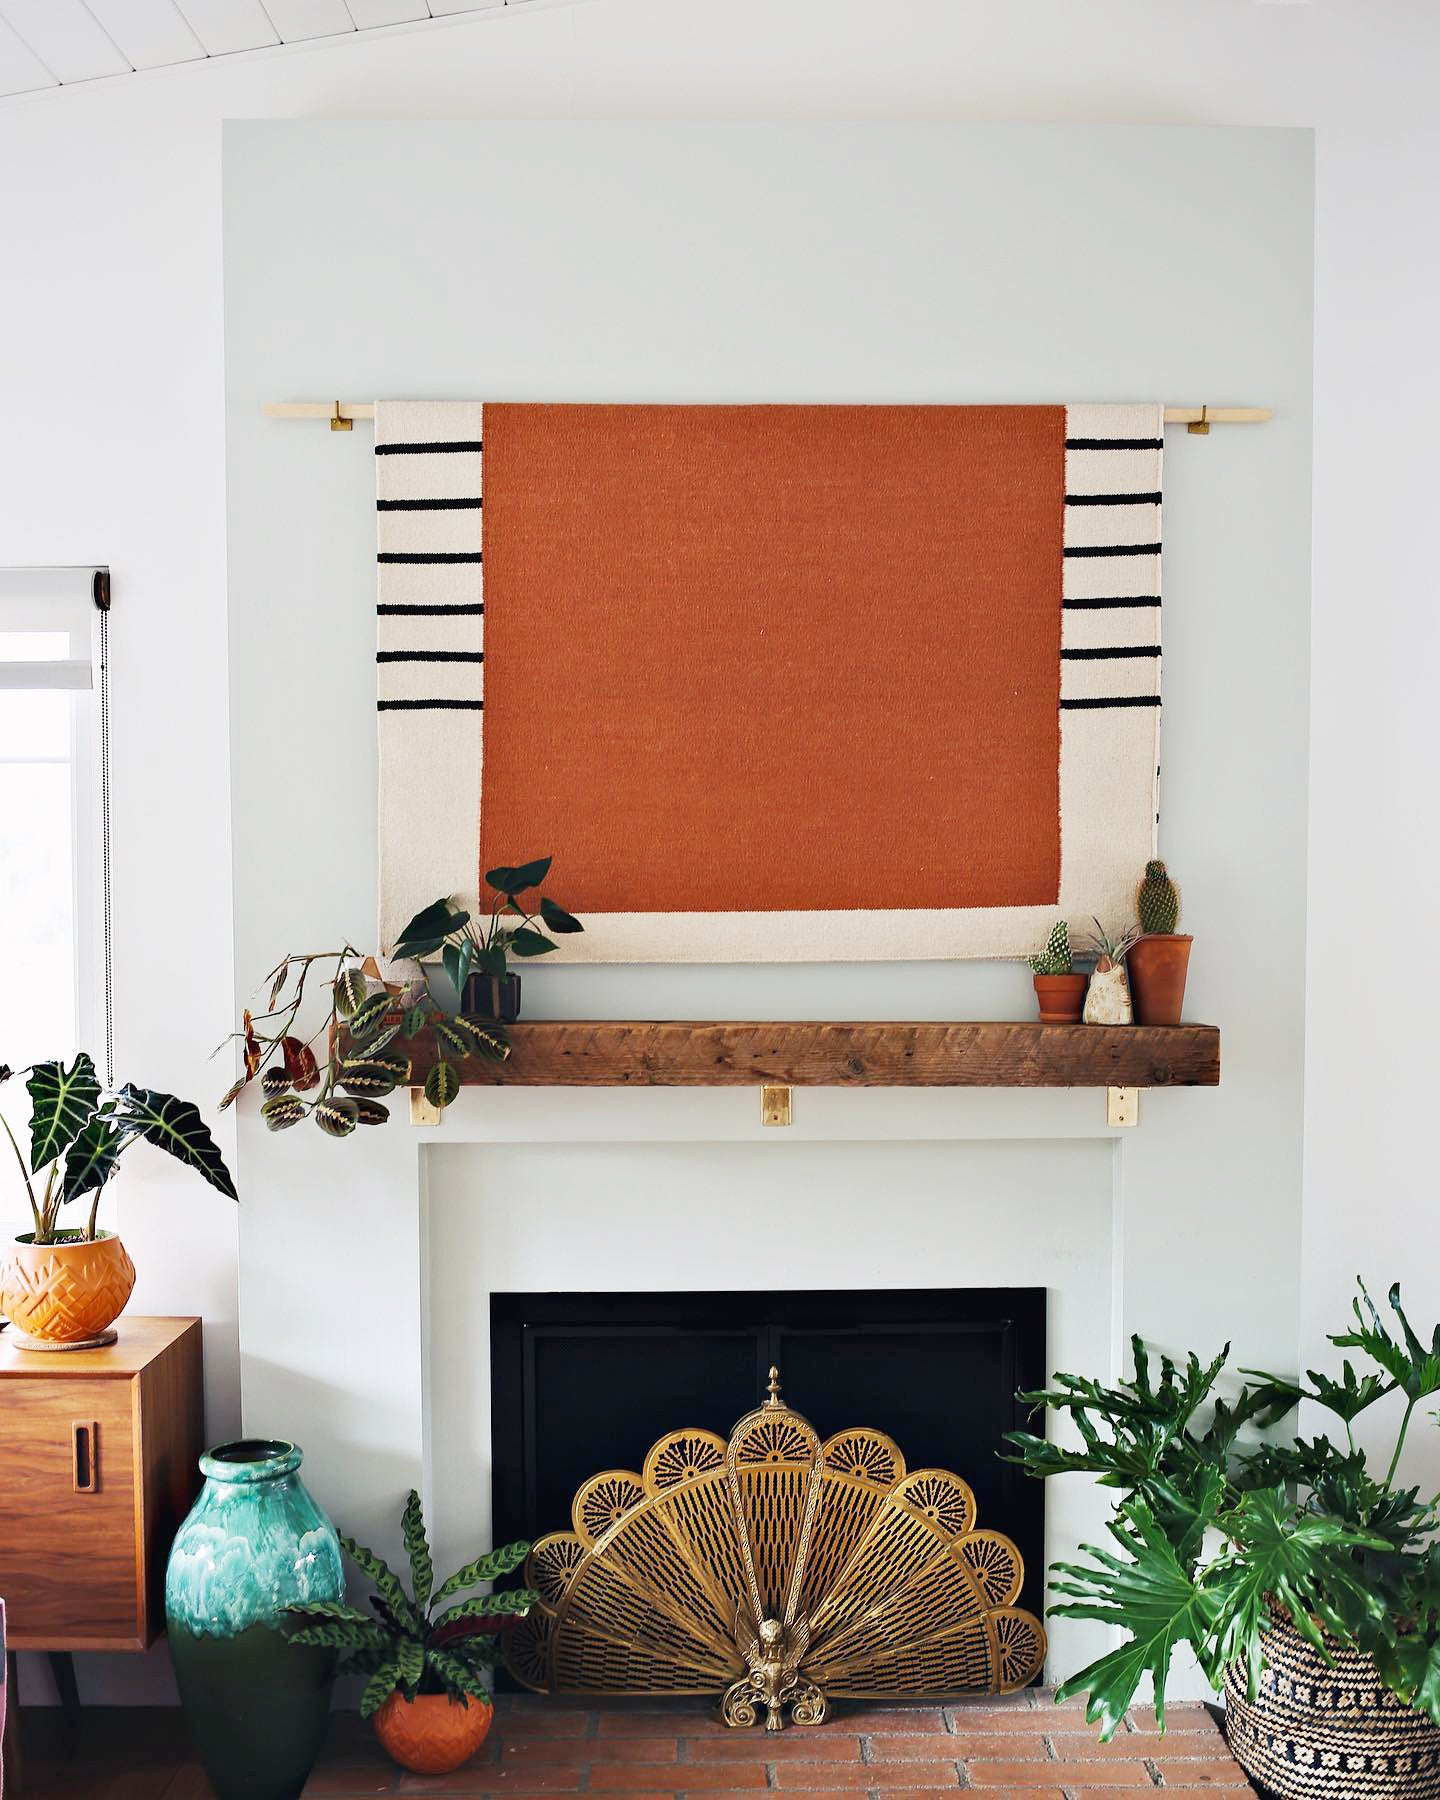 FEATURED_05_Fireplace Diy _ Kristin Guy Dine X Design